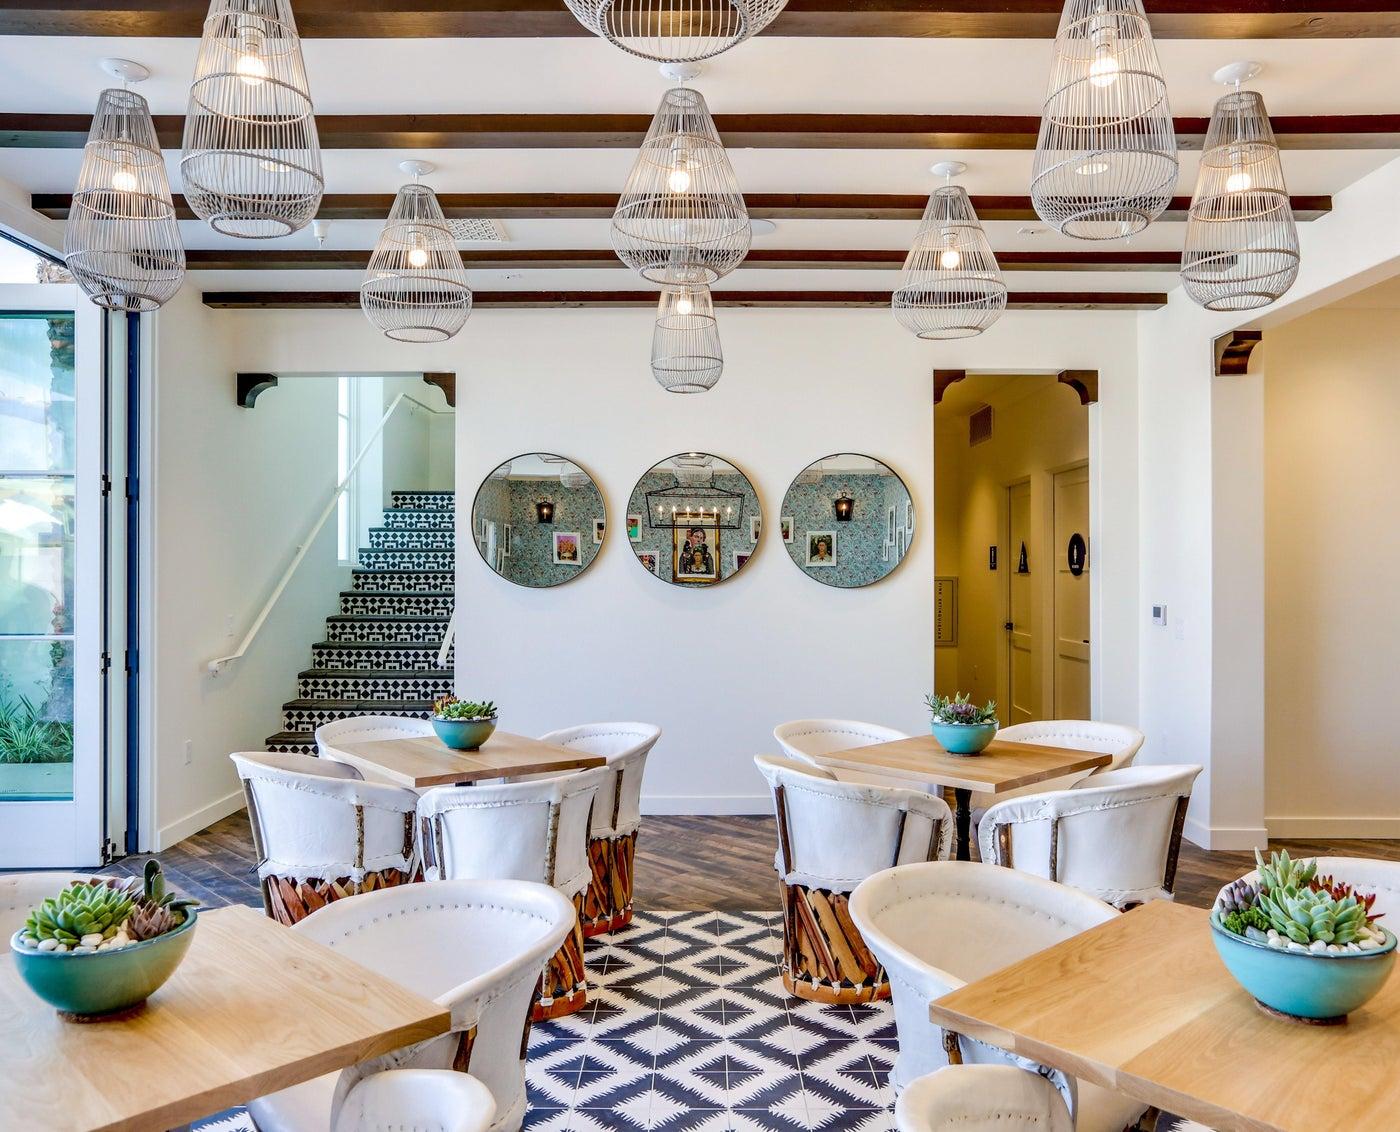 Dining area of Palm Springs La Serena Villas Azucar restaurant